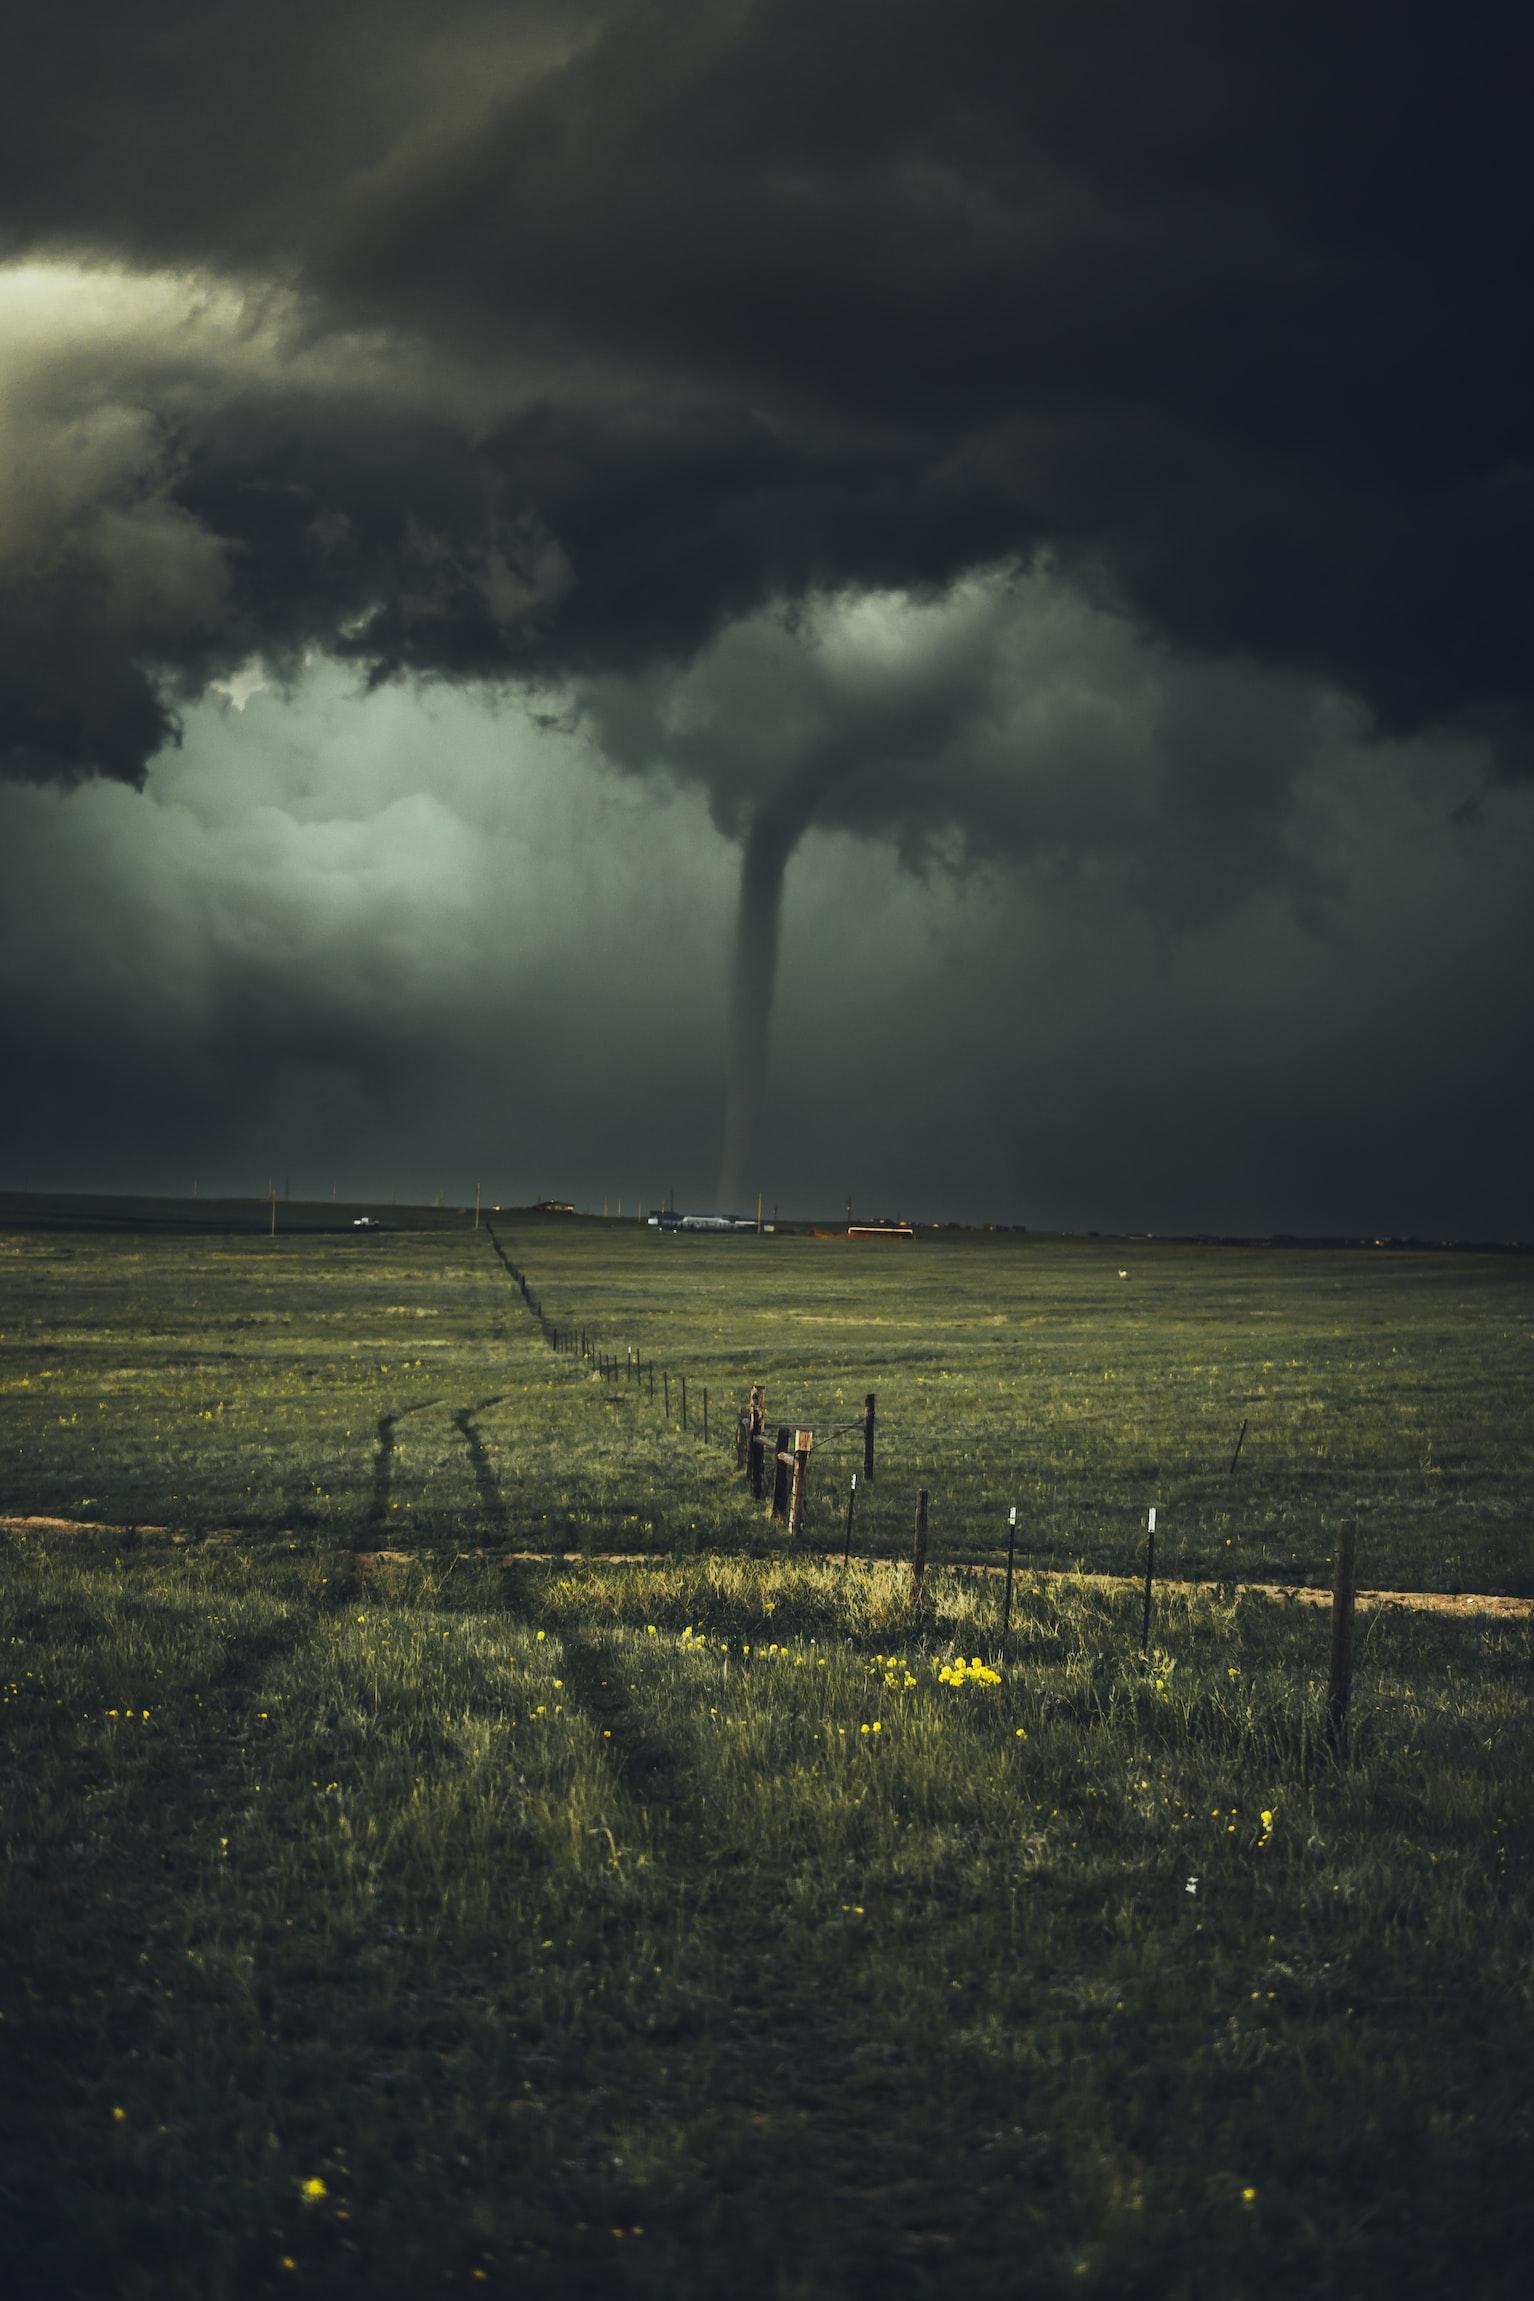 f5 tornado